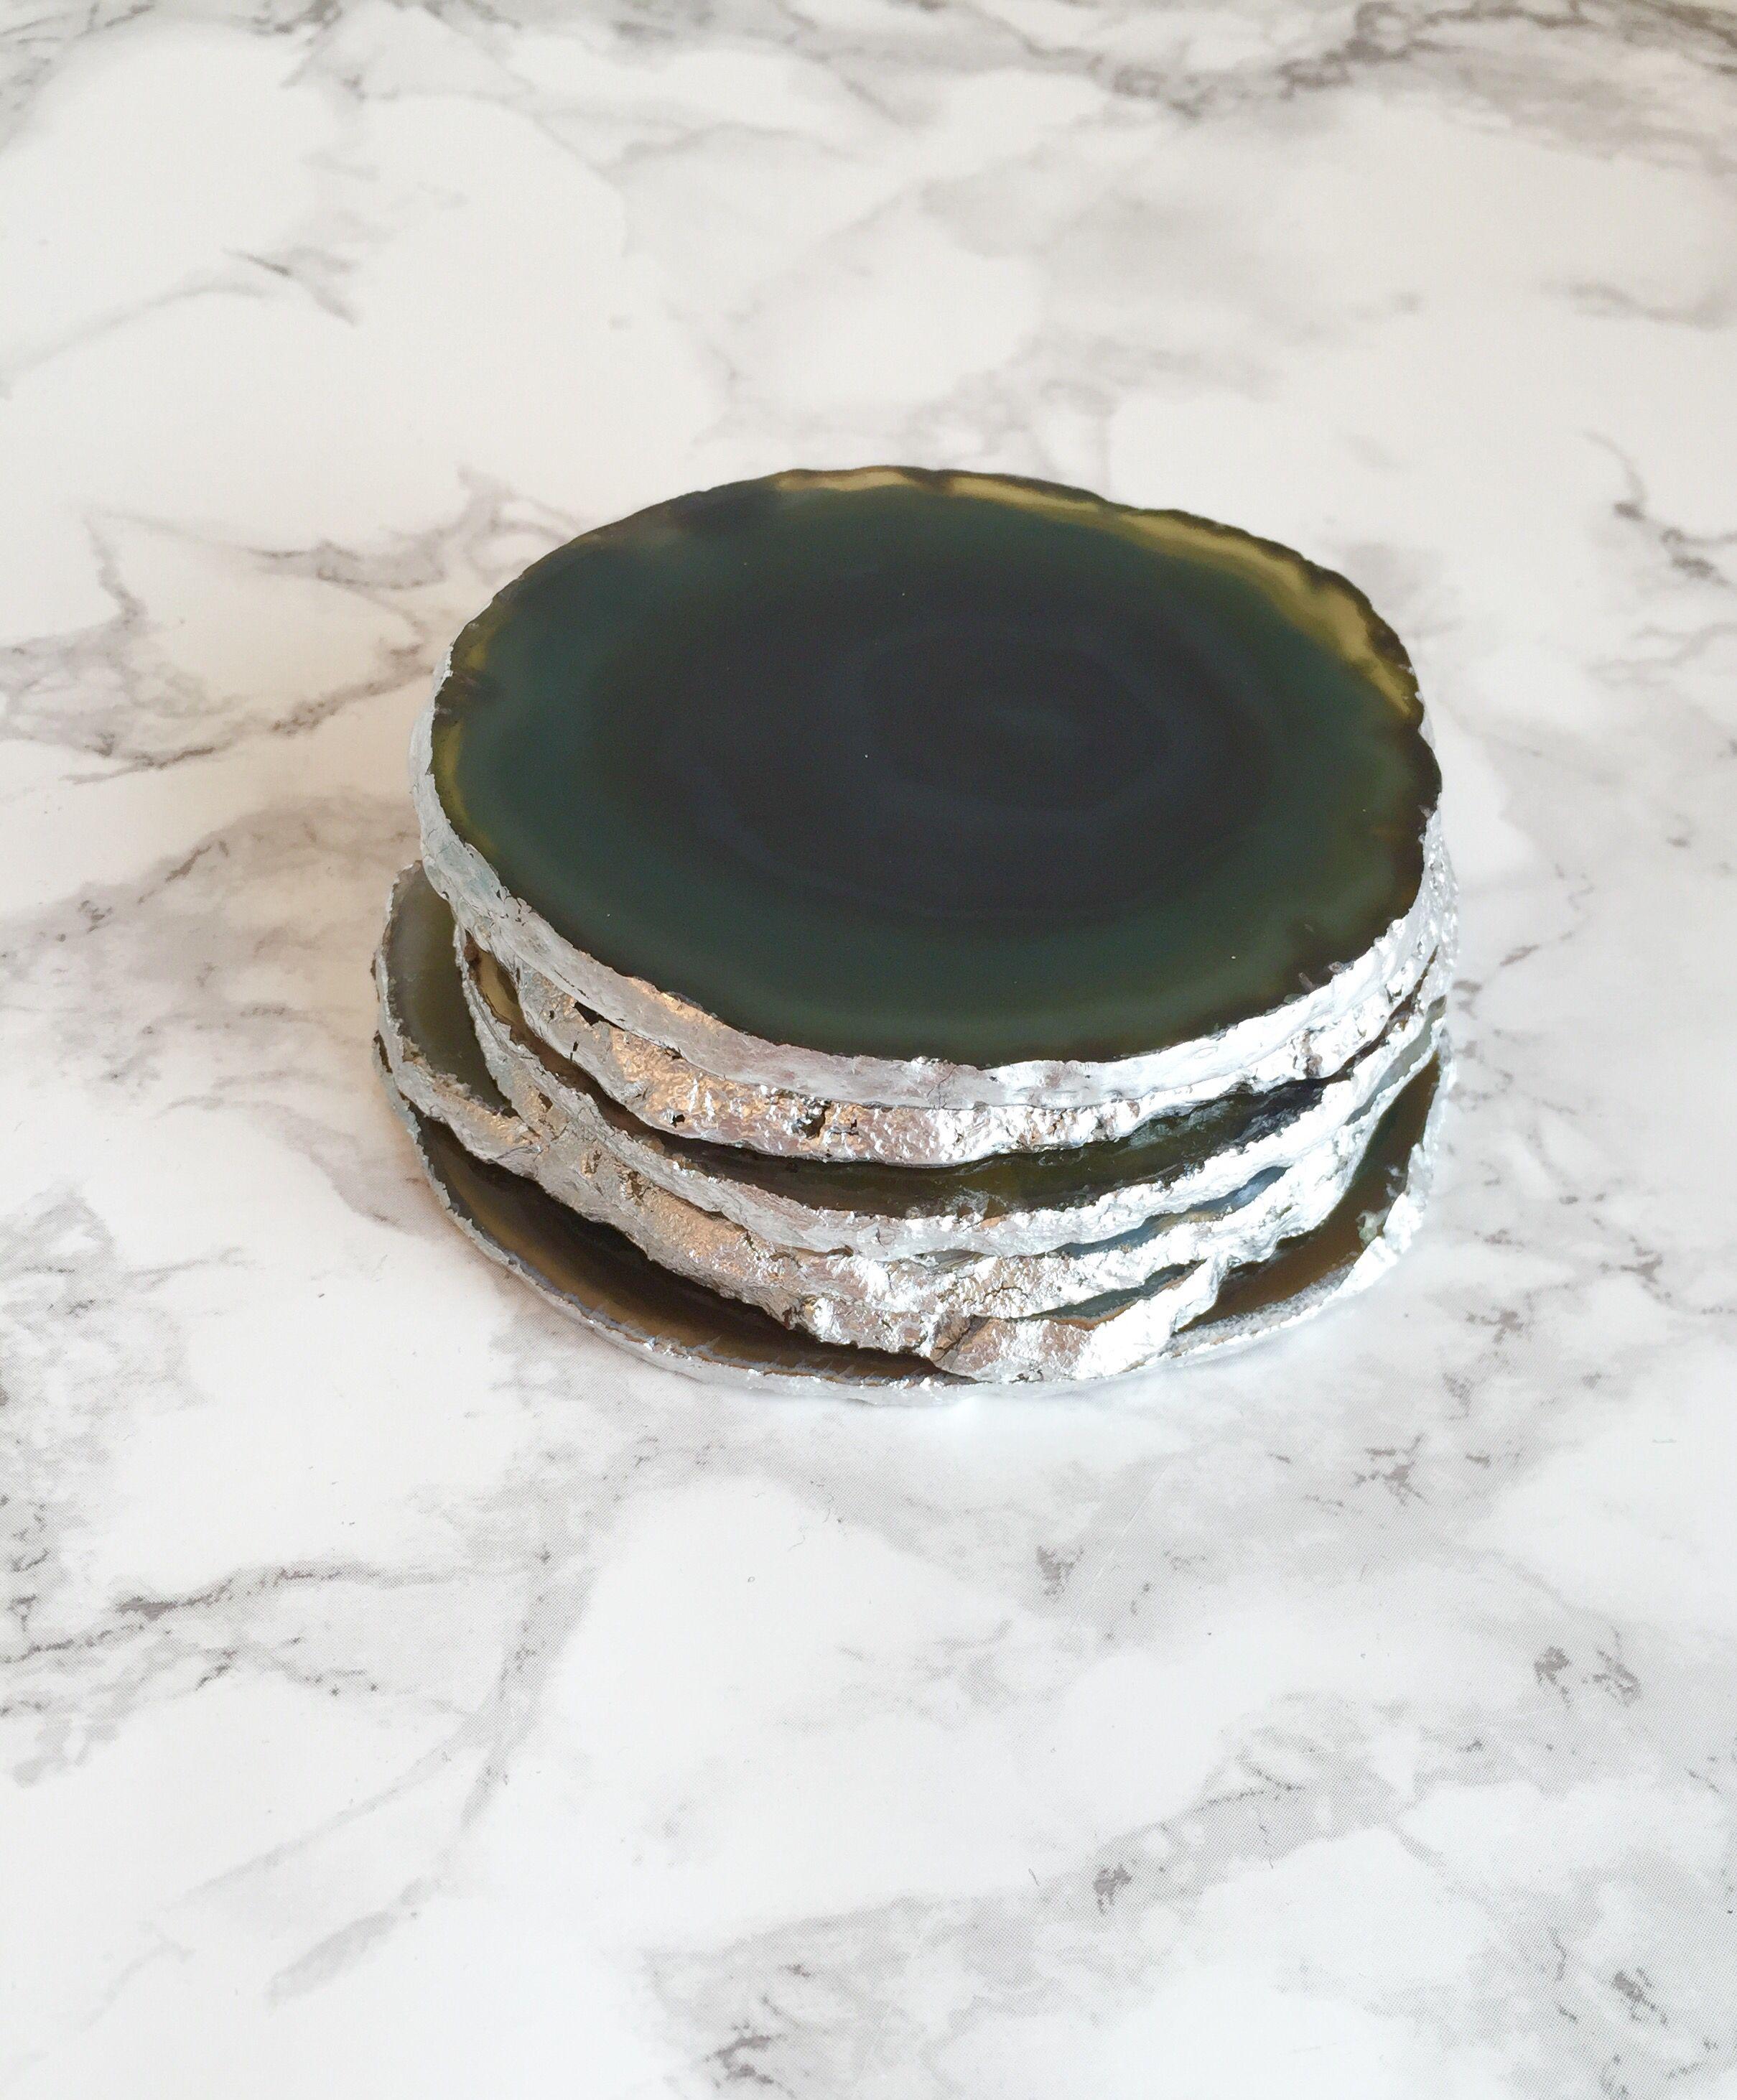 Green agate slice coasters silver leaf edging boho chic coffee